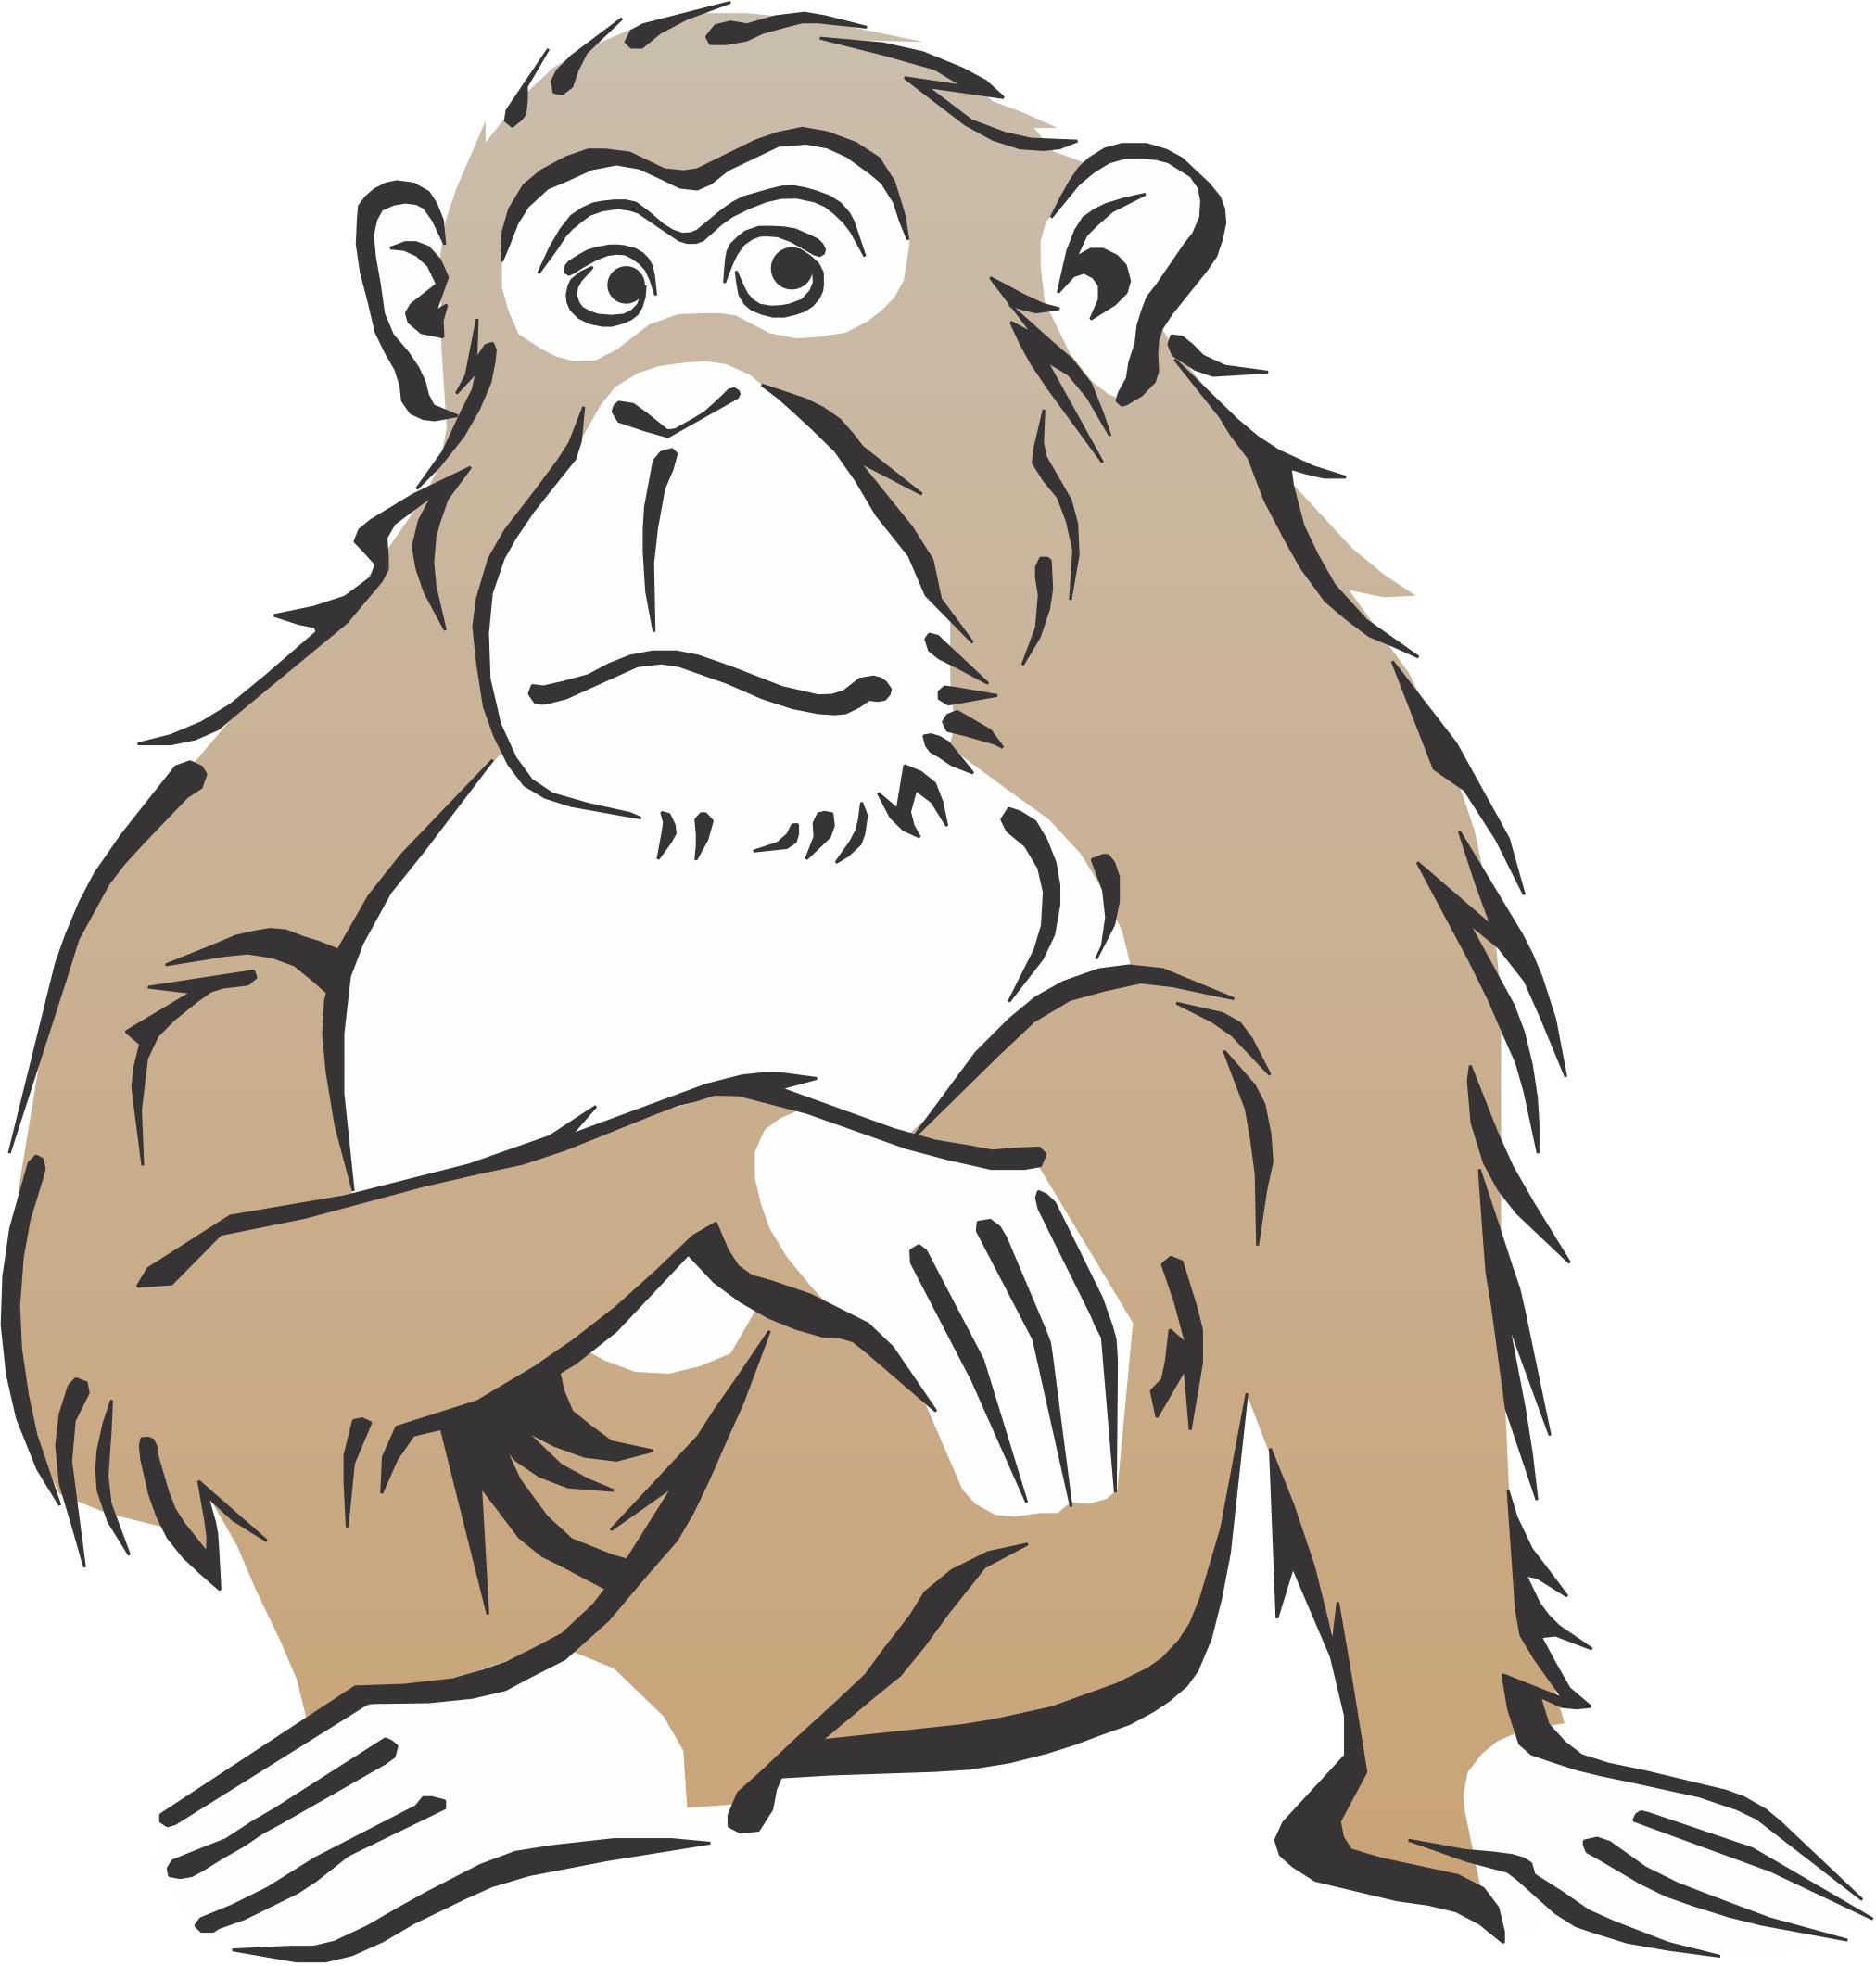 Monkey clip art library. Ape clipart realistic